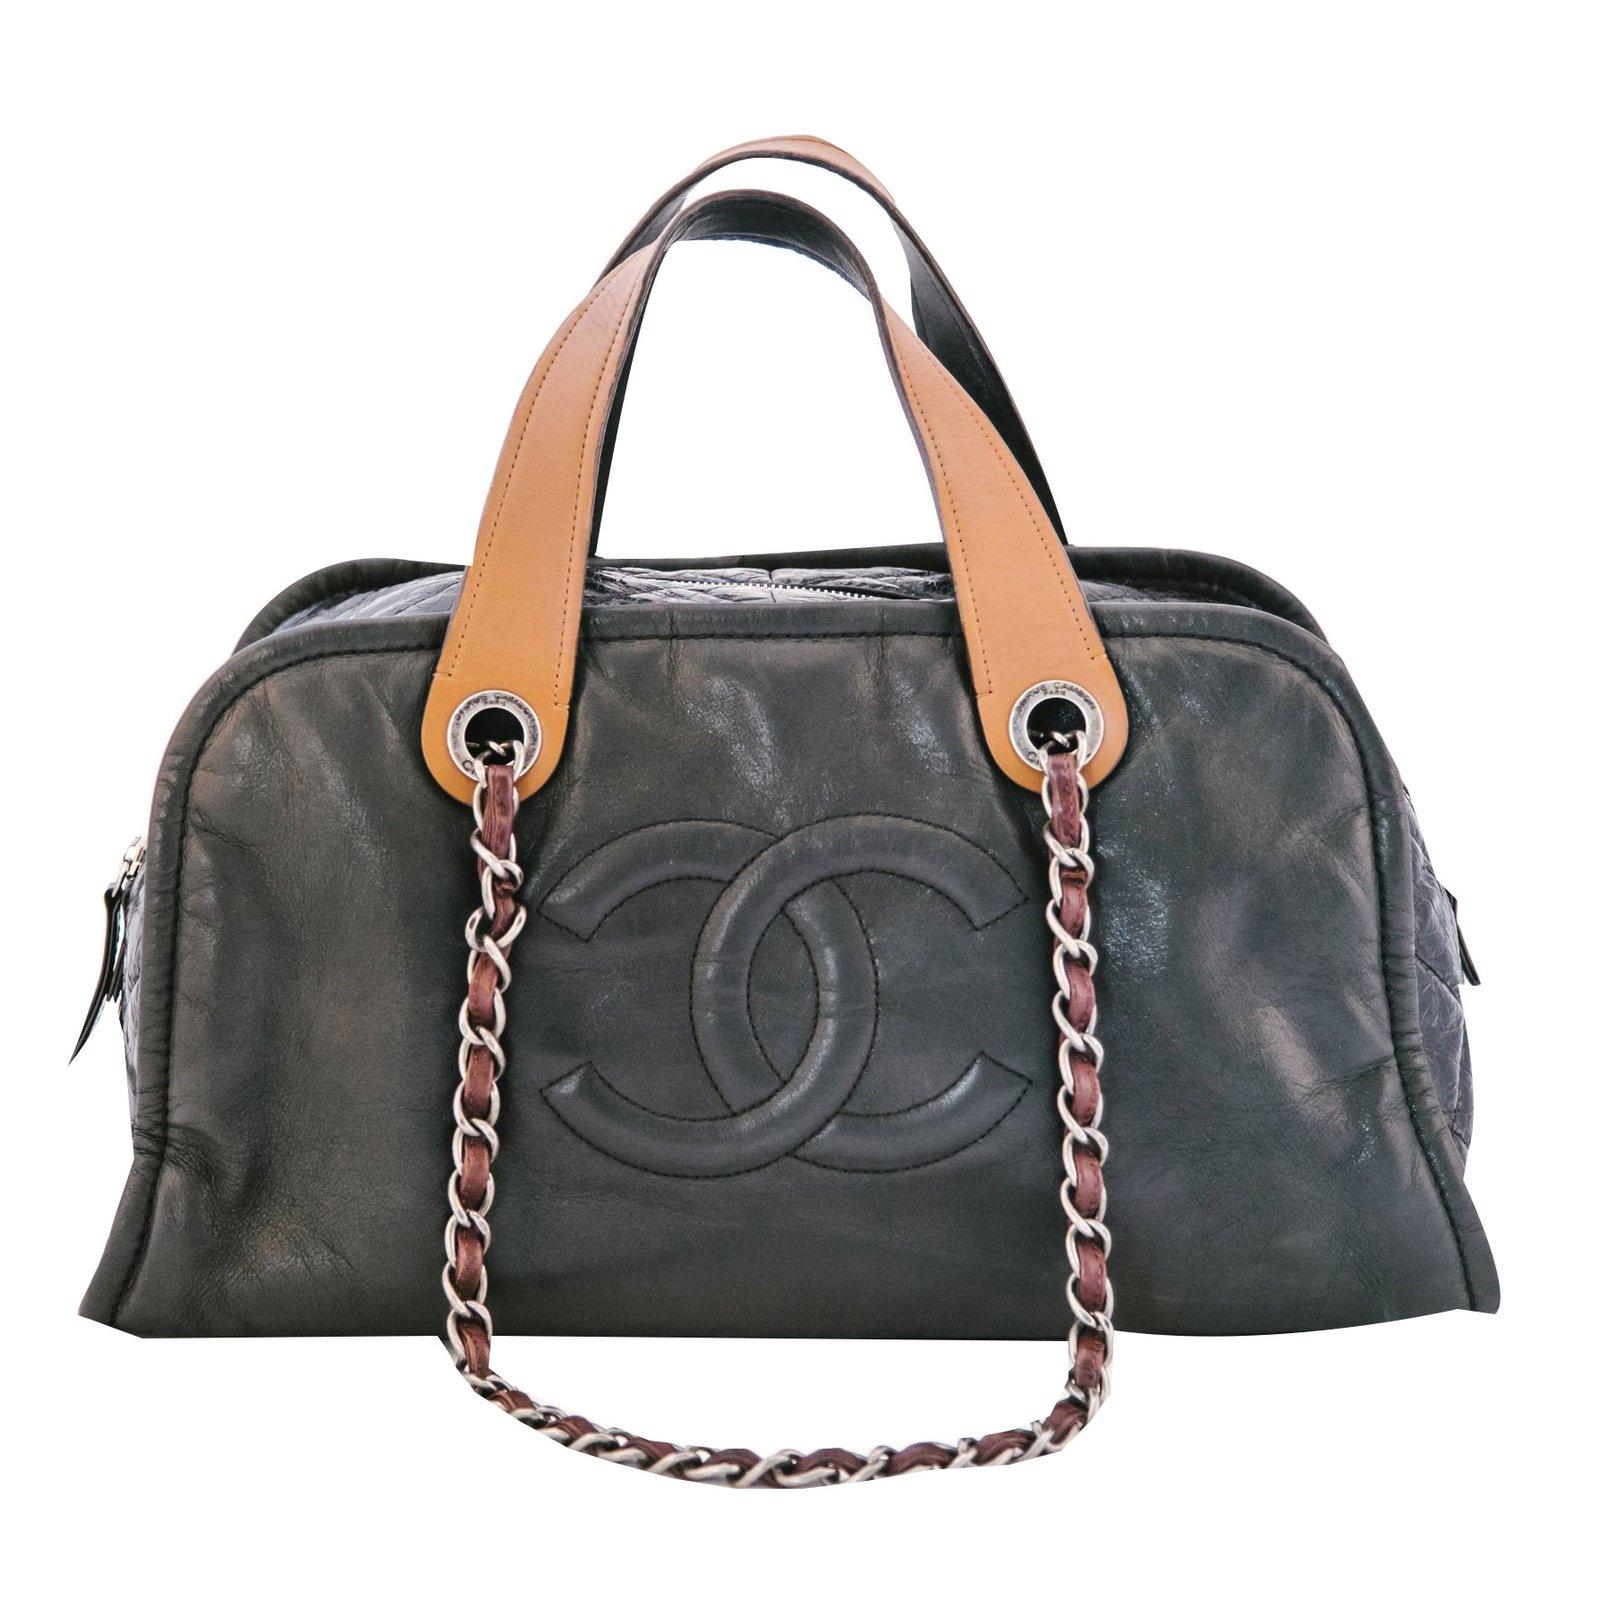 Chanel Bowling Bag Handbags Leather Black Ref 69815